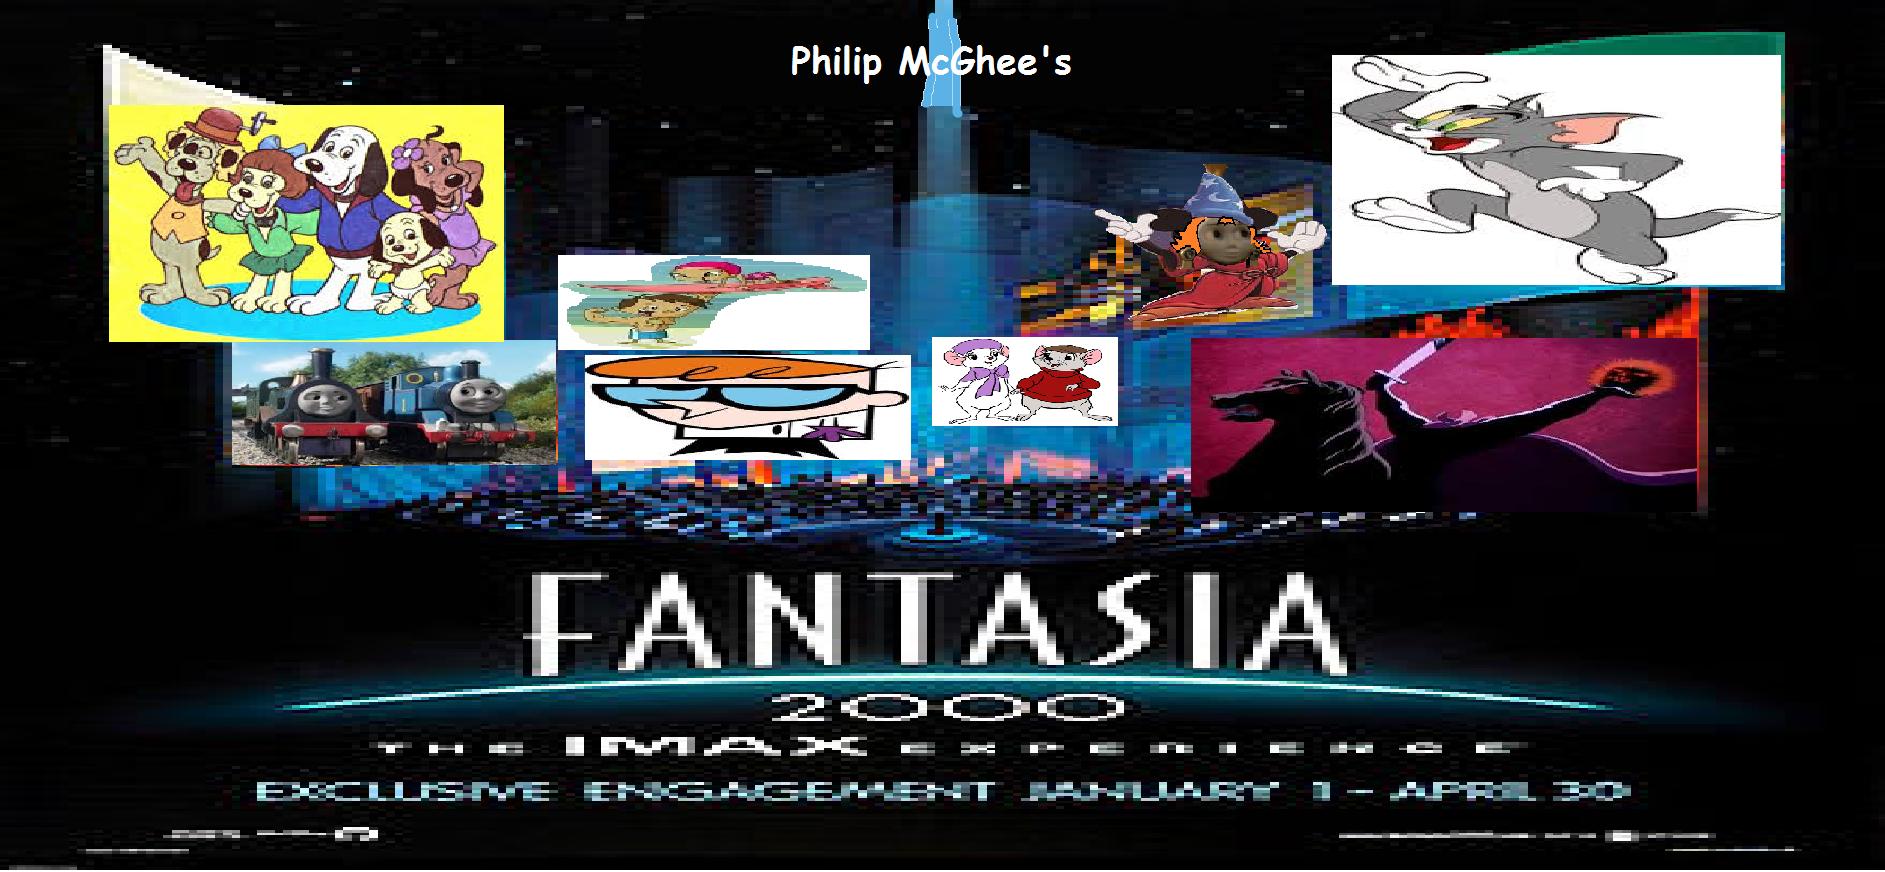 Fantasia 2000 (BrittalCroftFan Style)